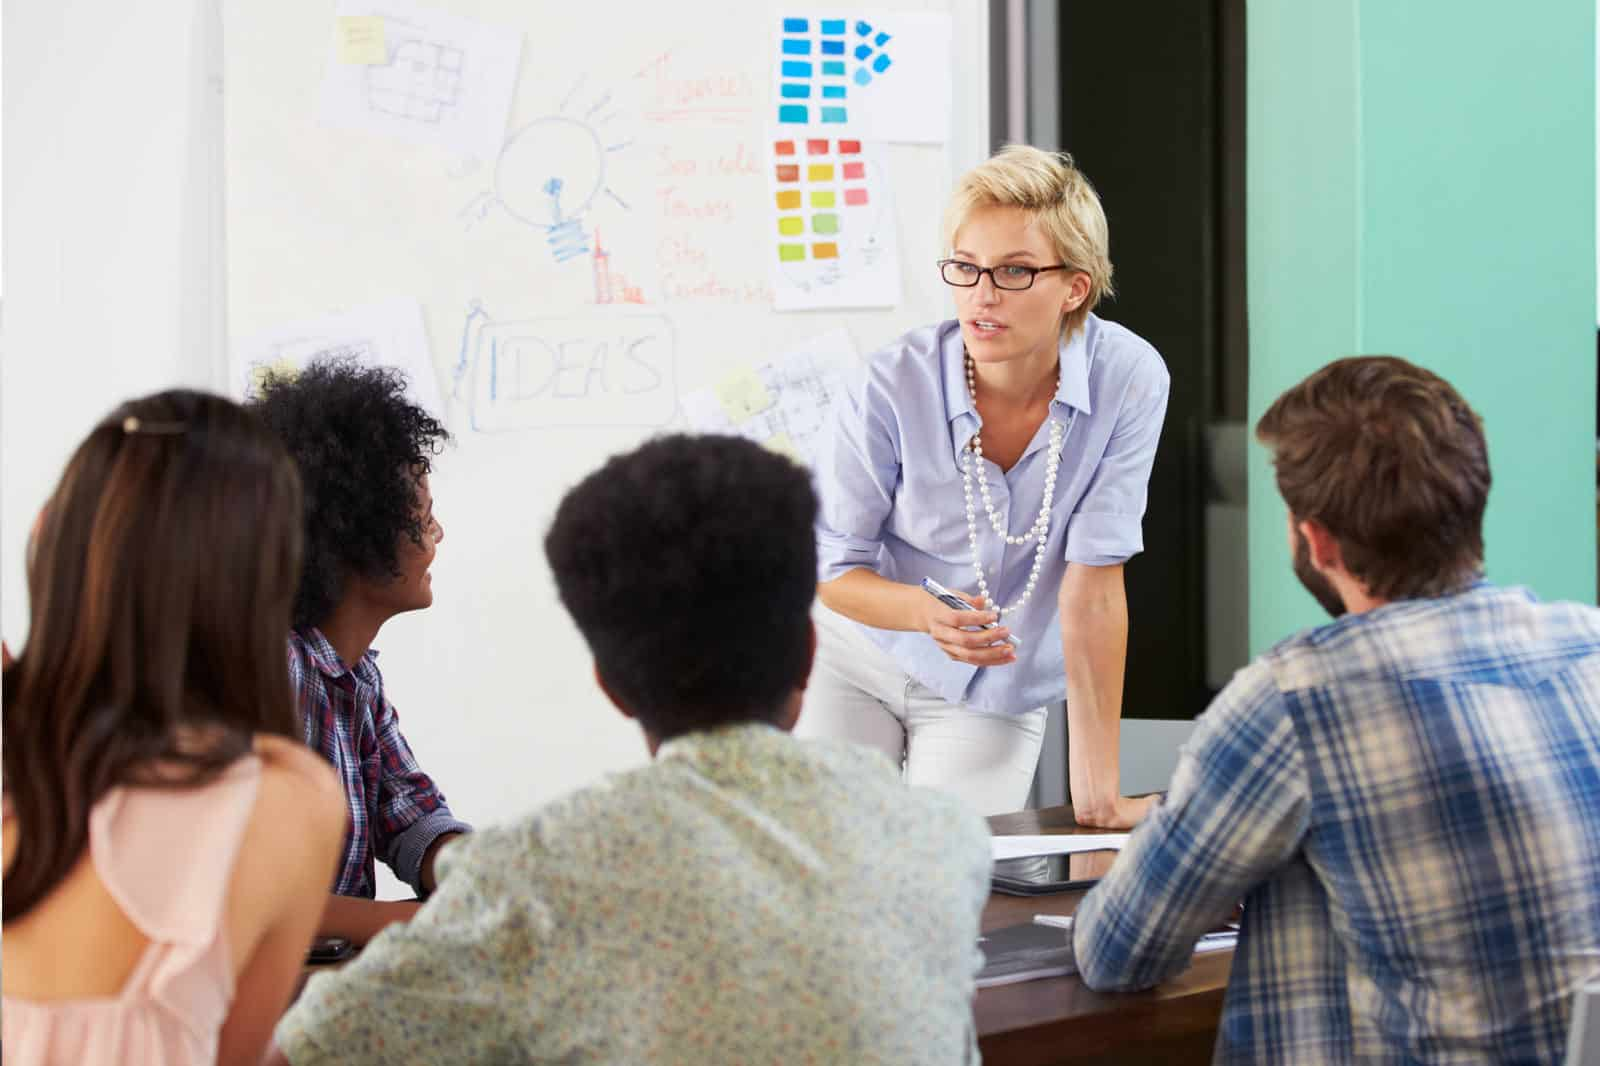 effective meeting management essay